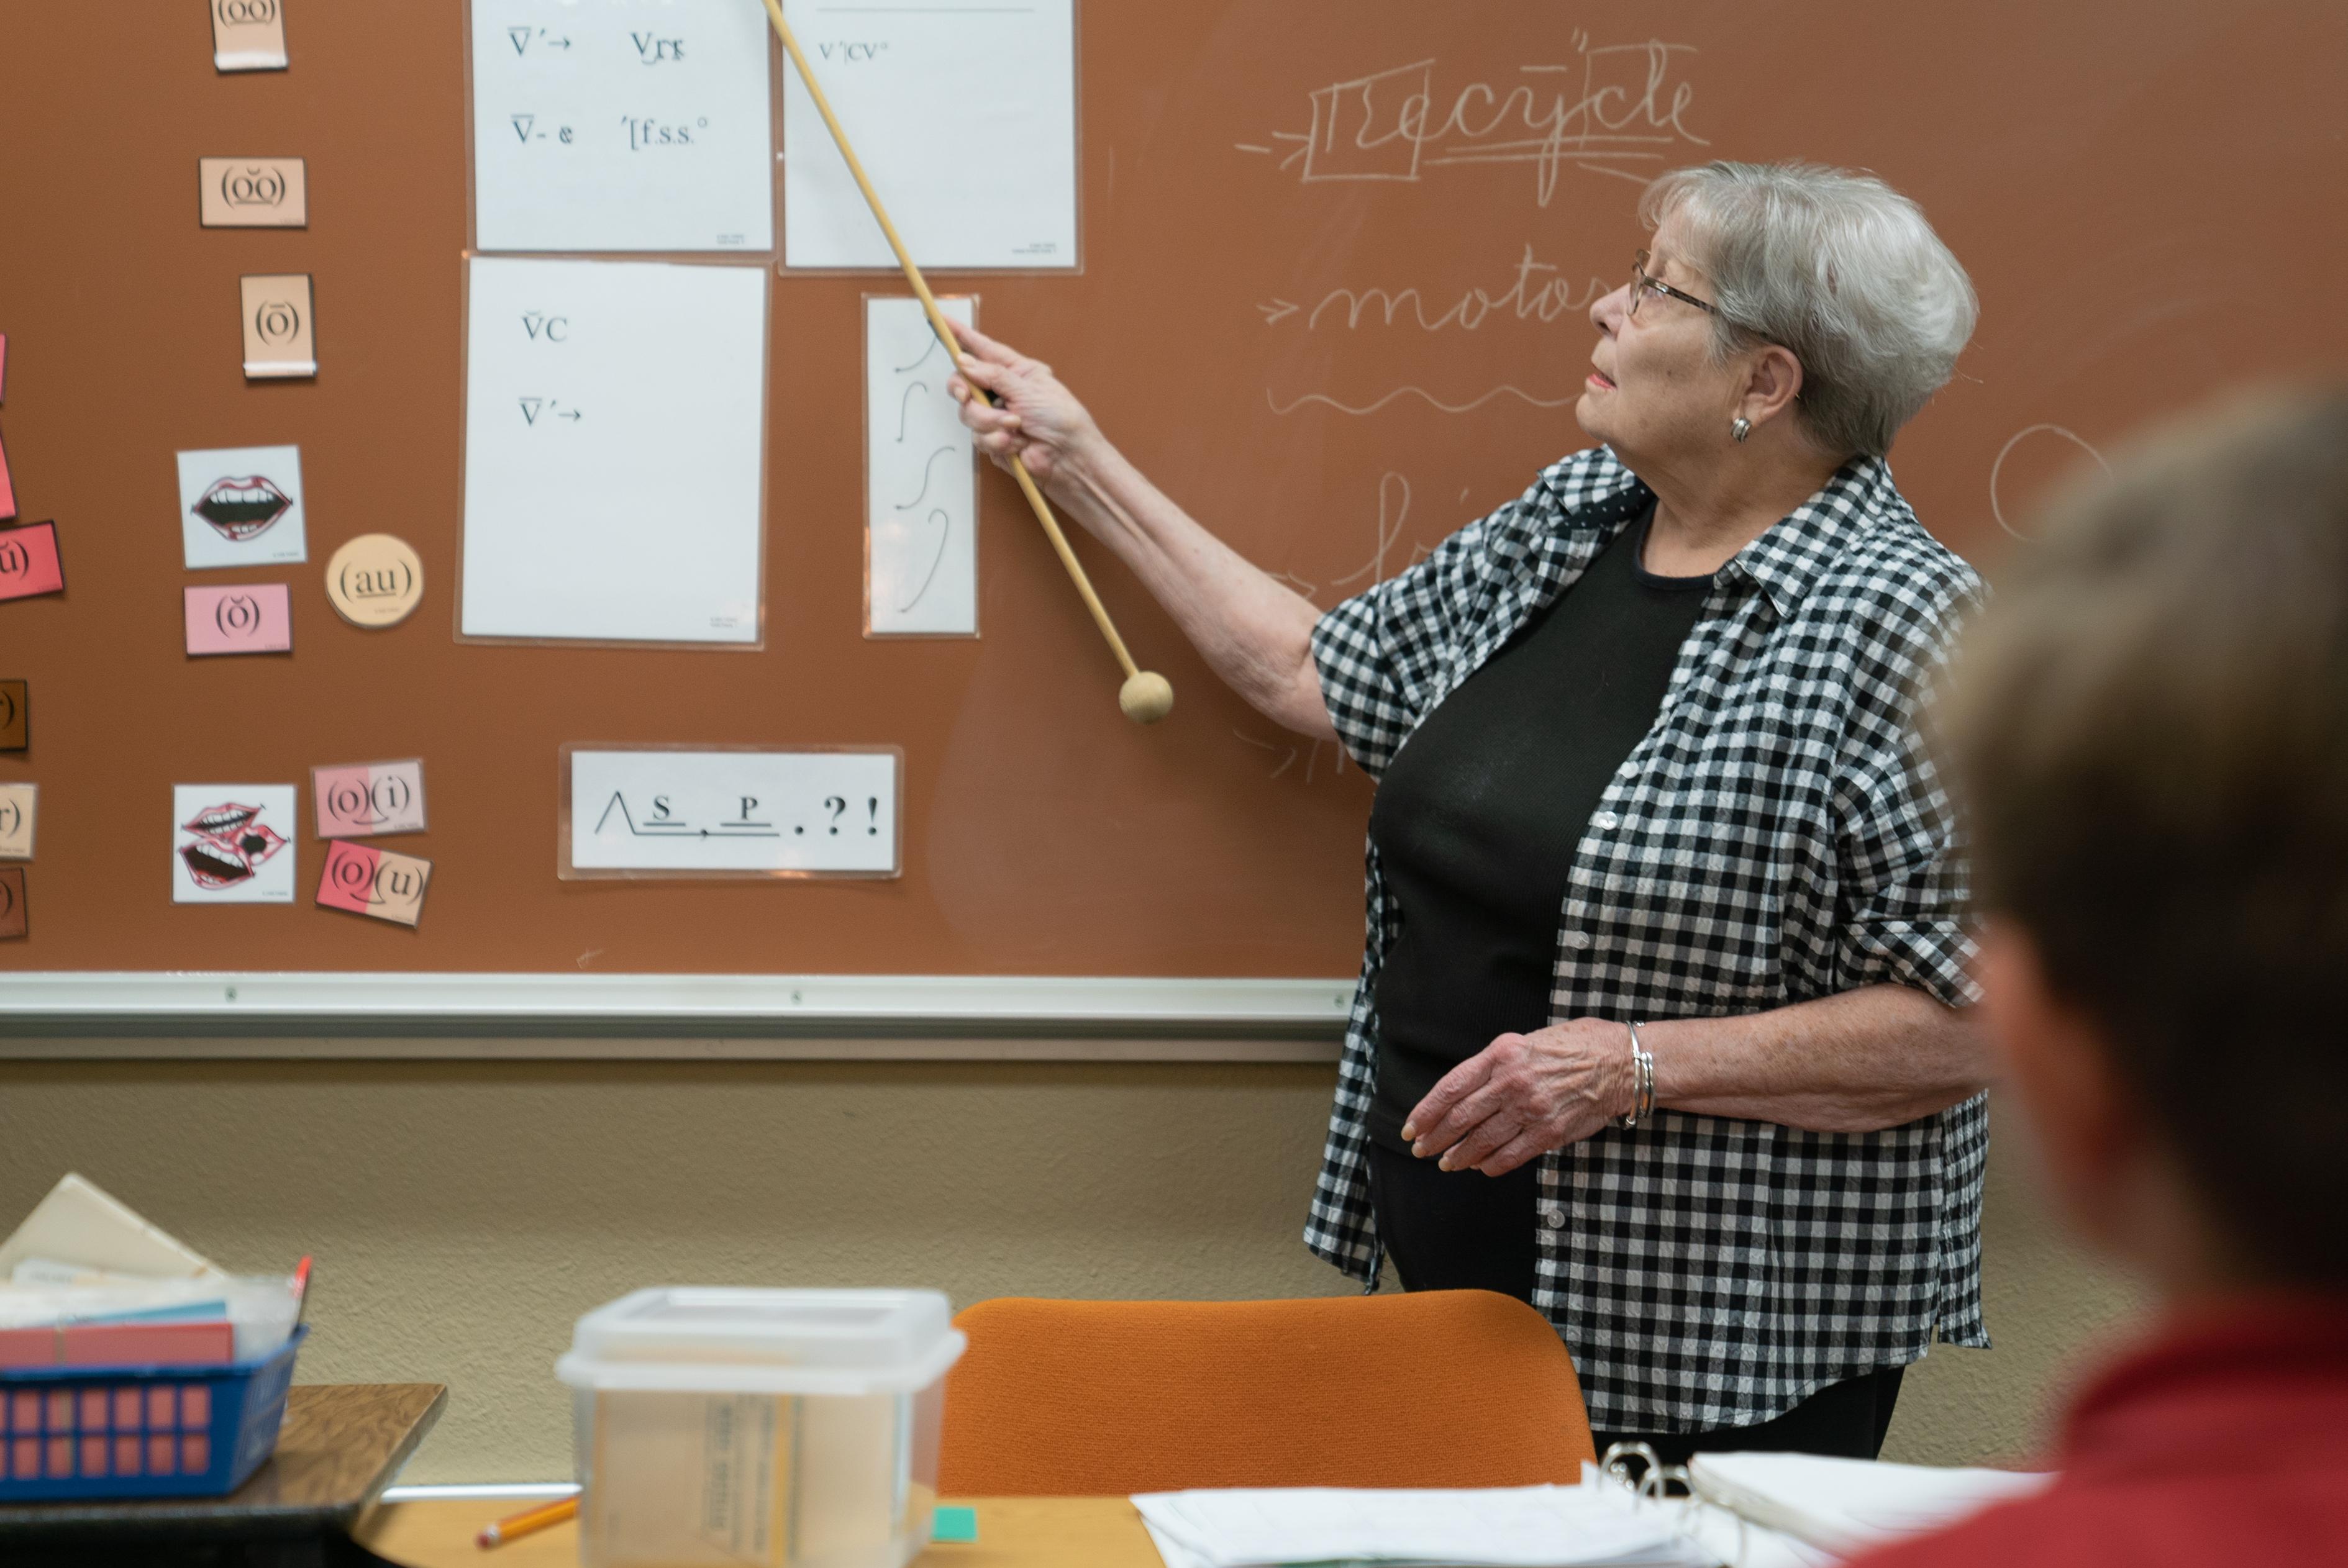 Dyslexia therapist pointing to chalkboard